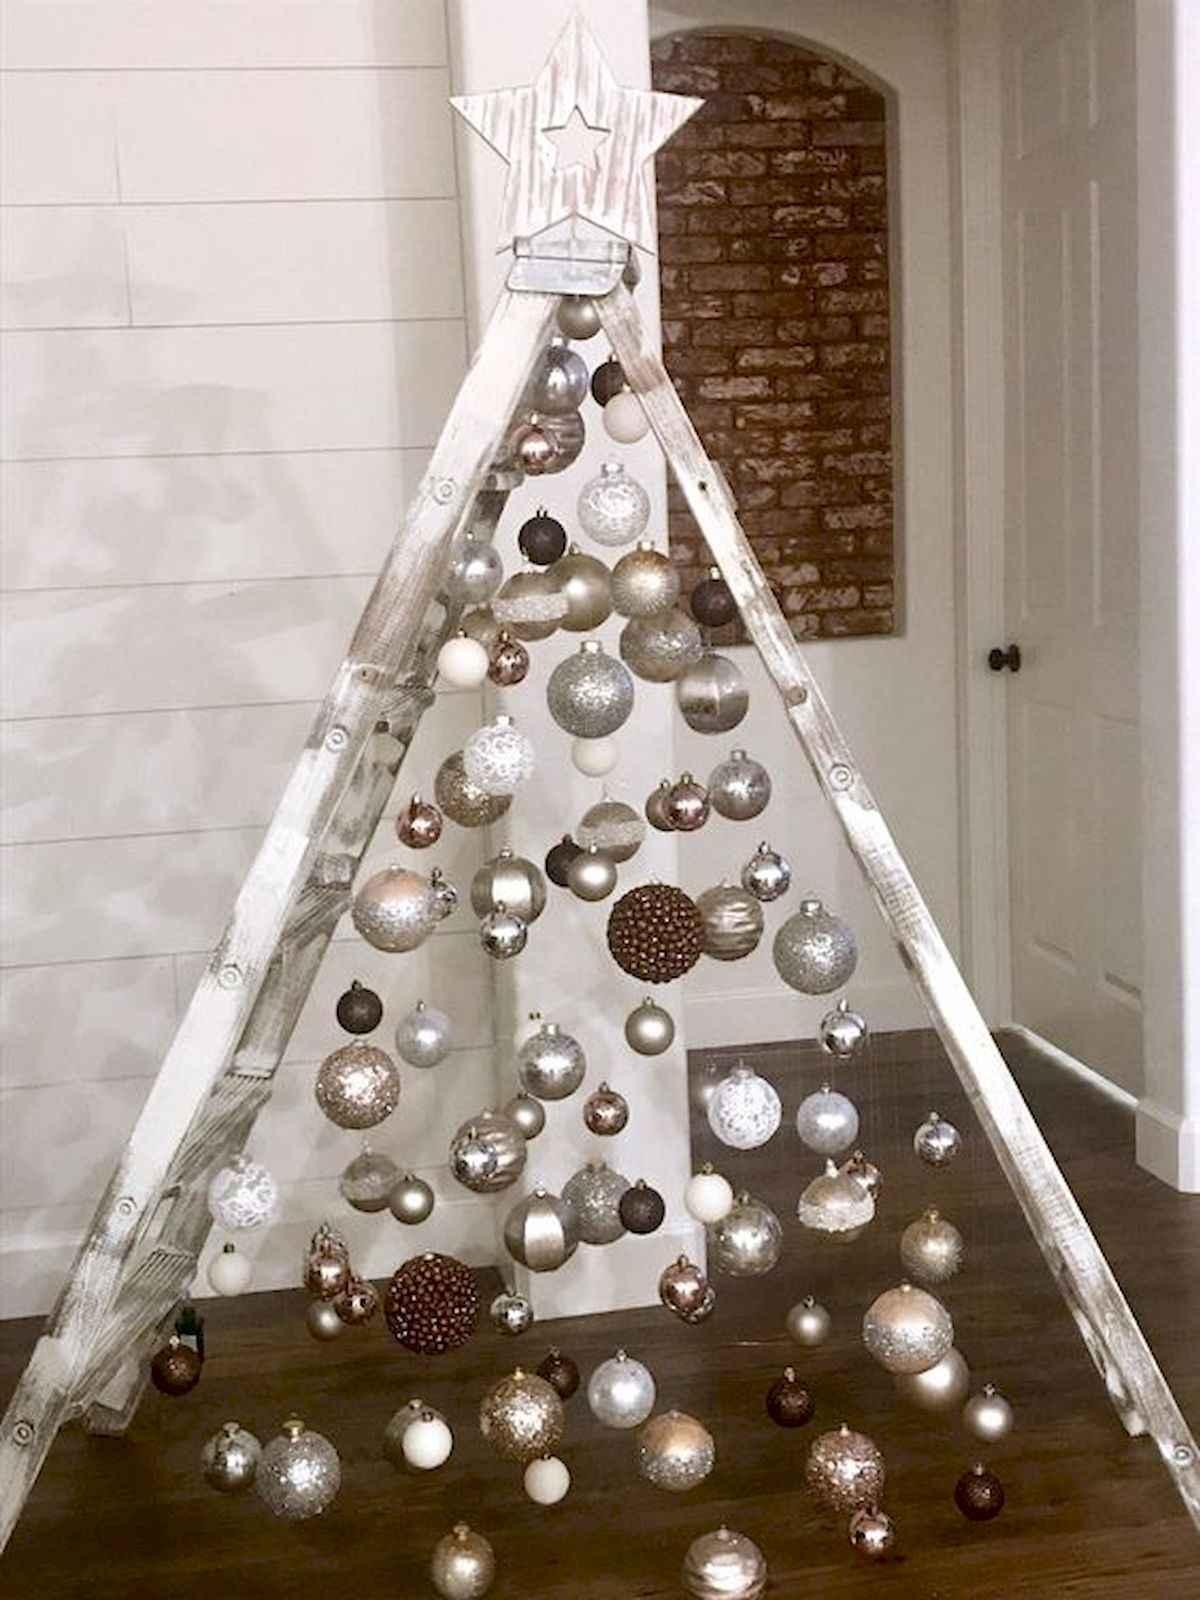 40 unique christmas tree ideas decorations (11)